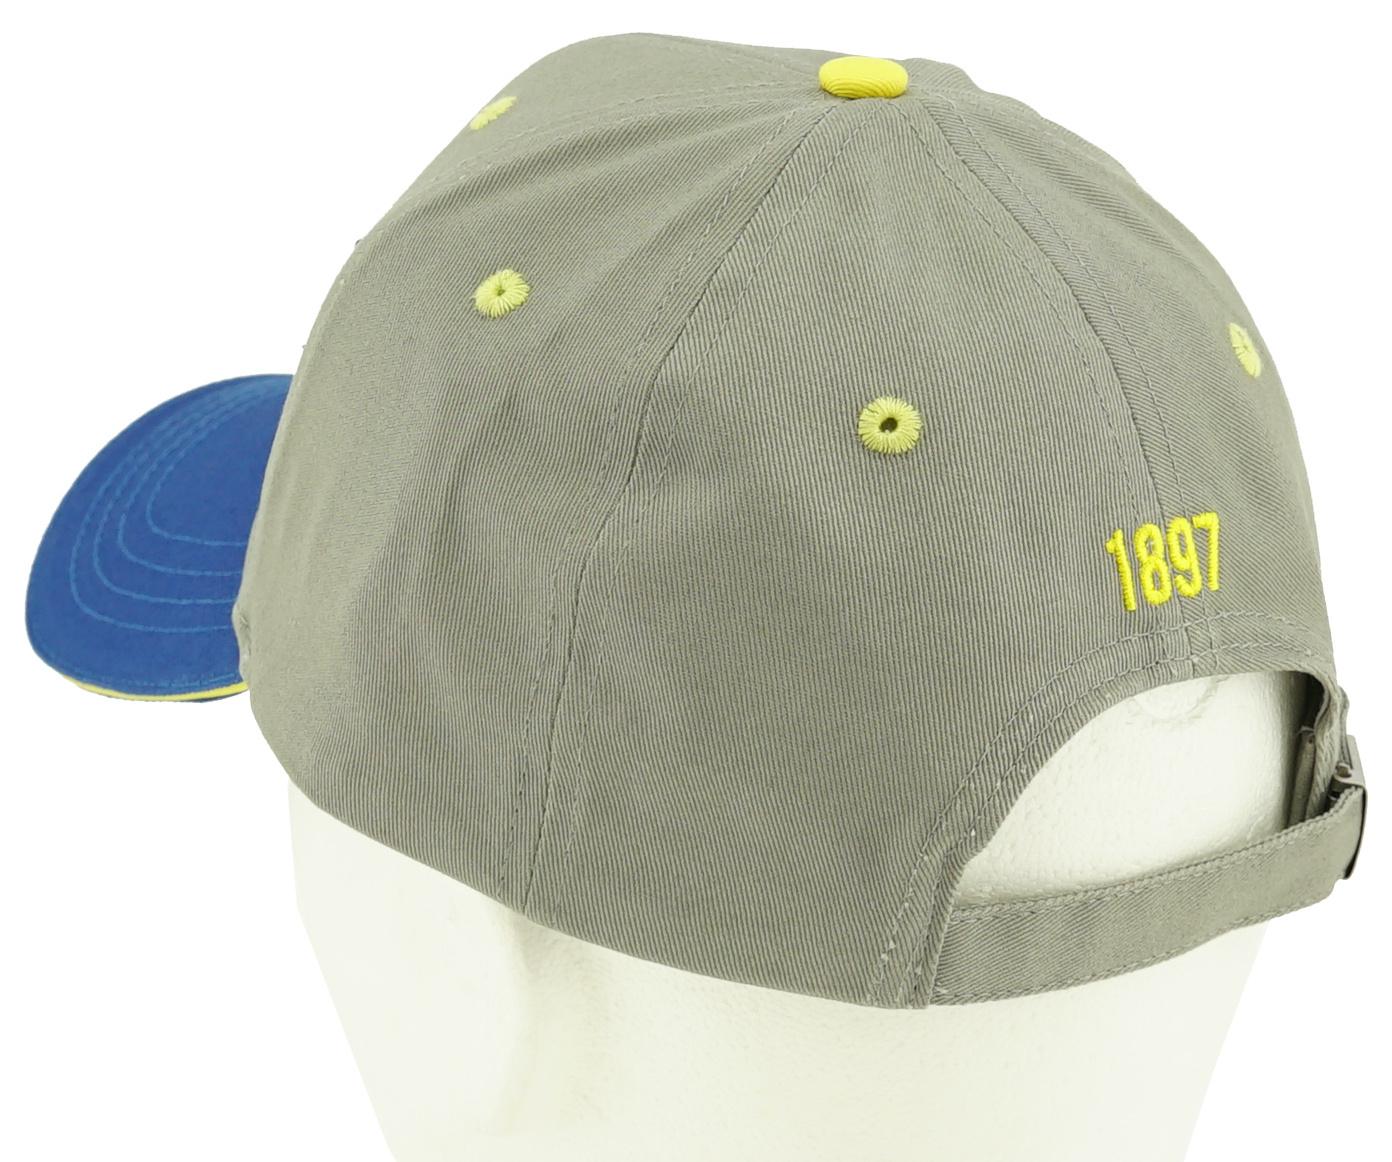 Topfanz Cap grey/blue RUSG X 1897 - Union